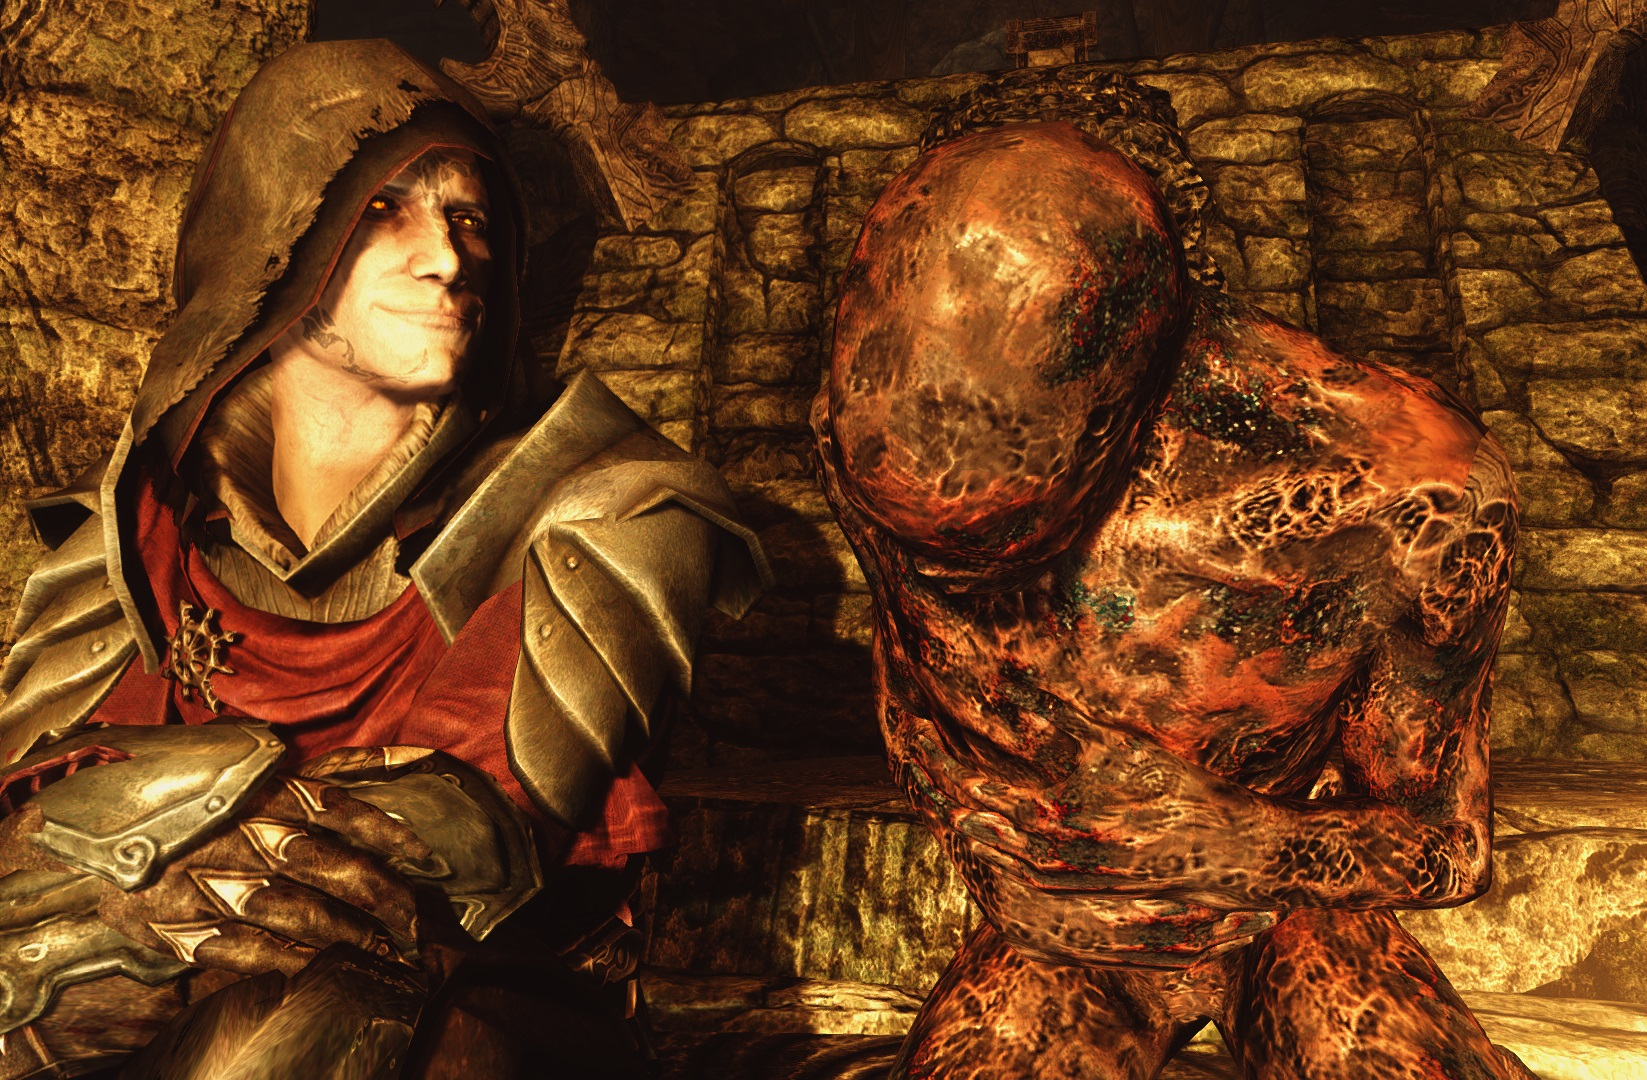 pain - Elder Scrolls 5: Skyrim, the